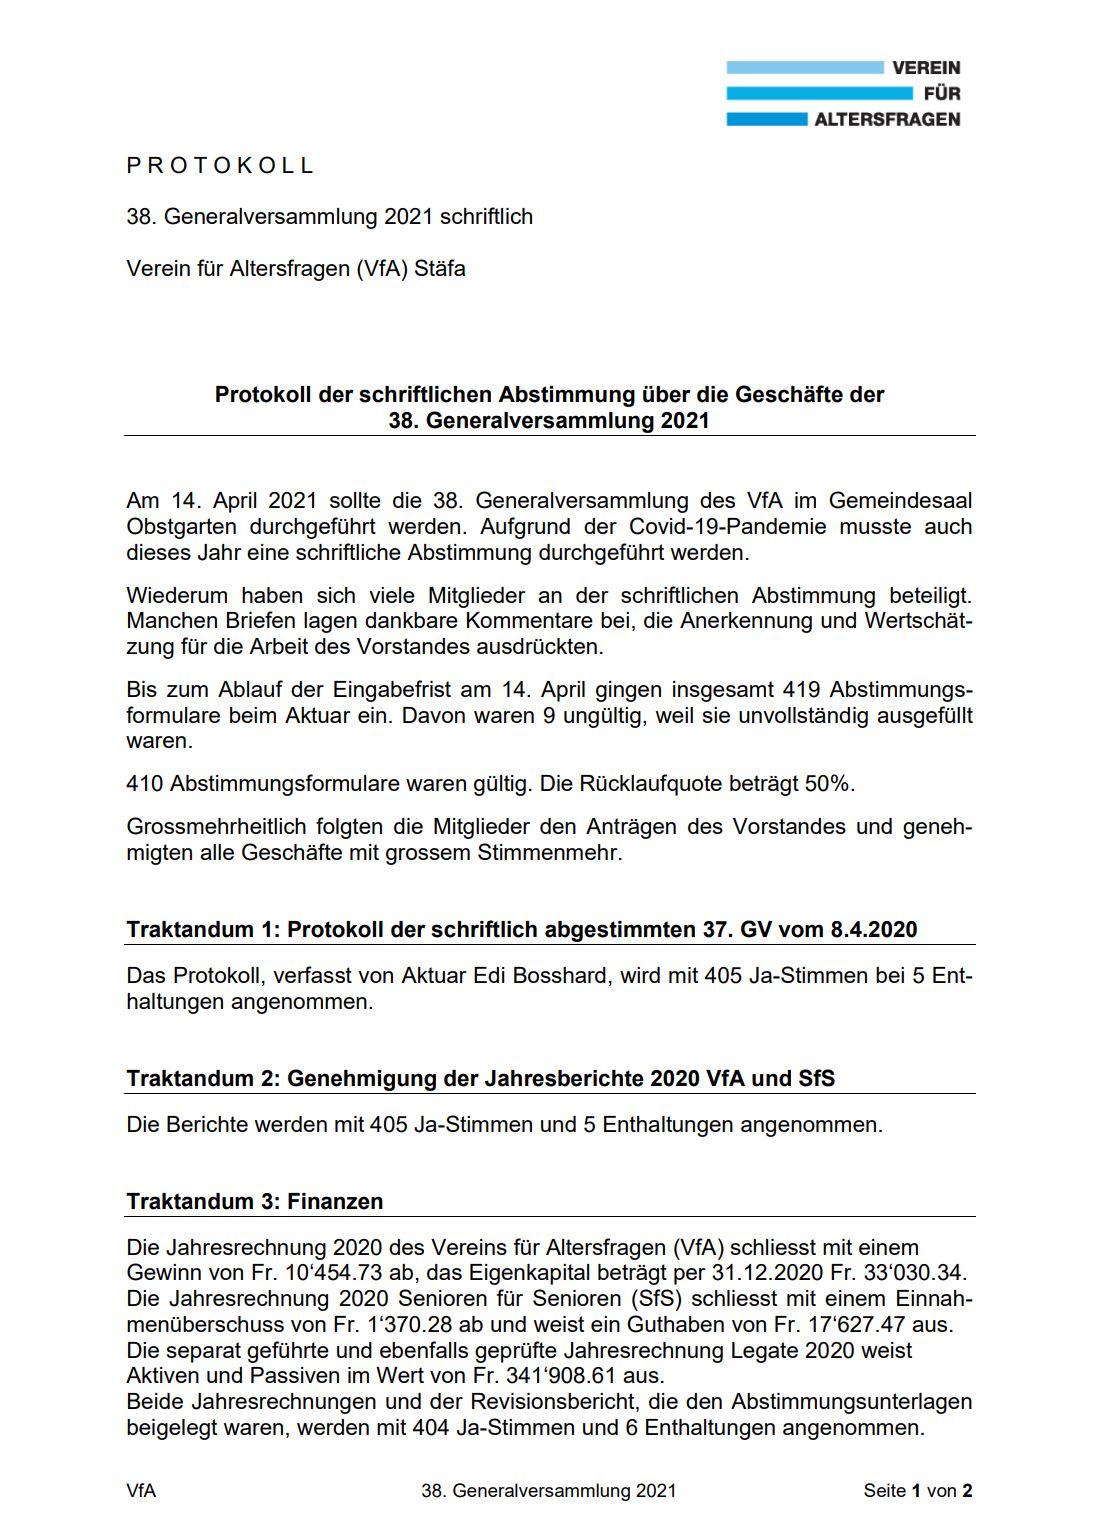 GV Protokoll VfA 2021